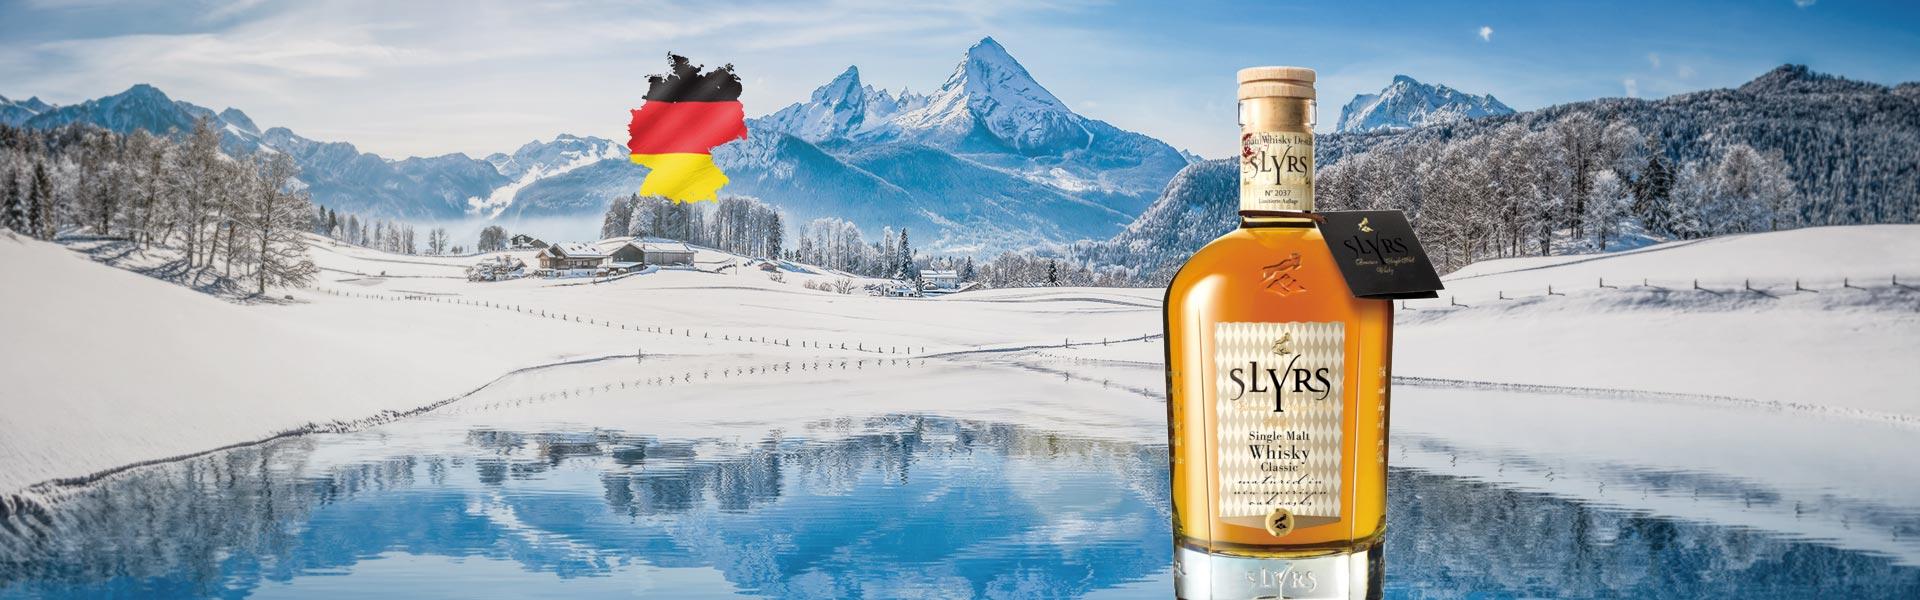 Classic Bavarian Single Malt Whisky